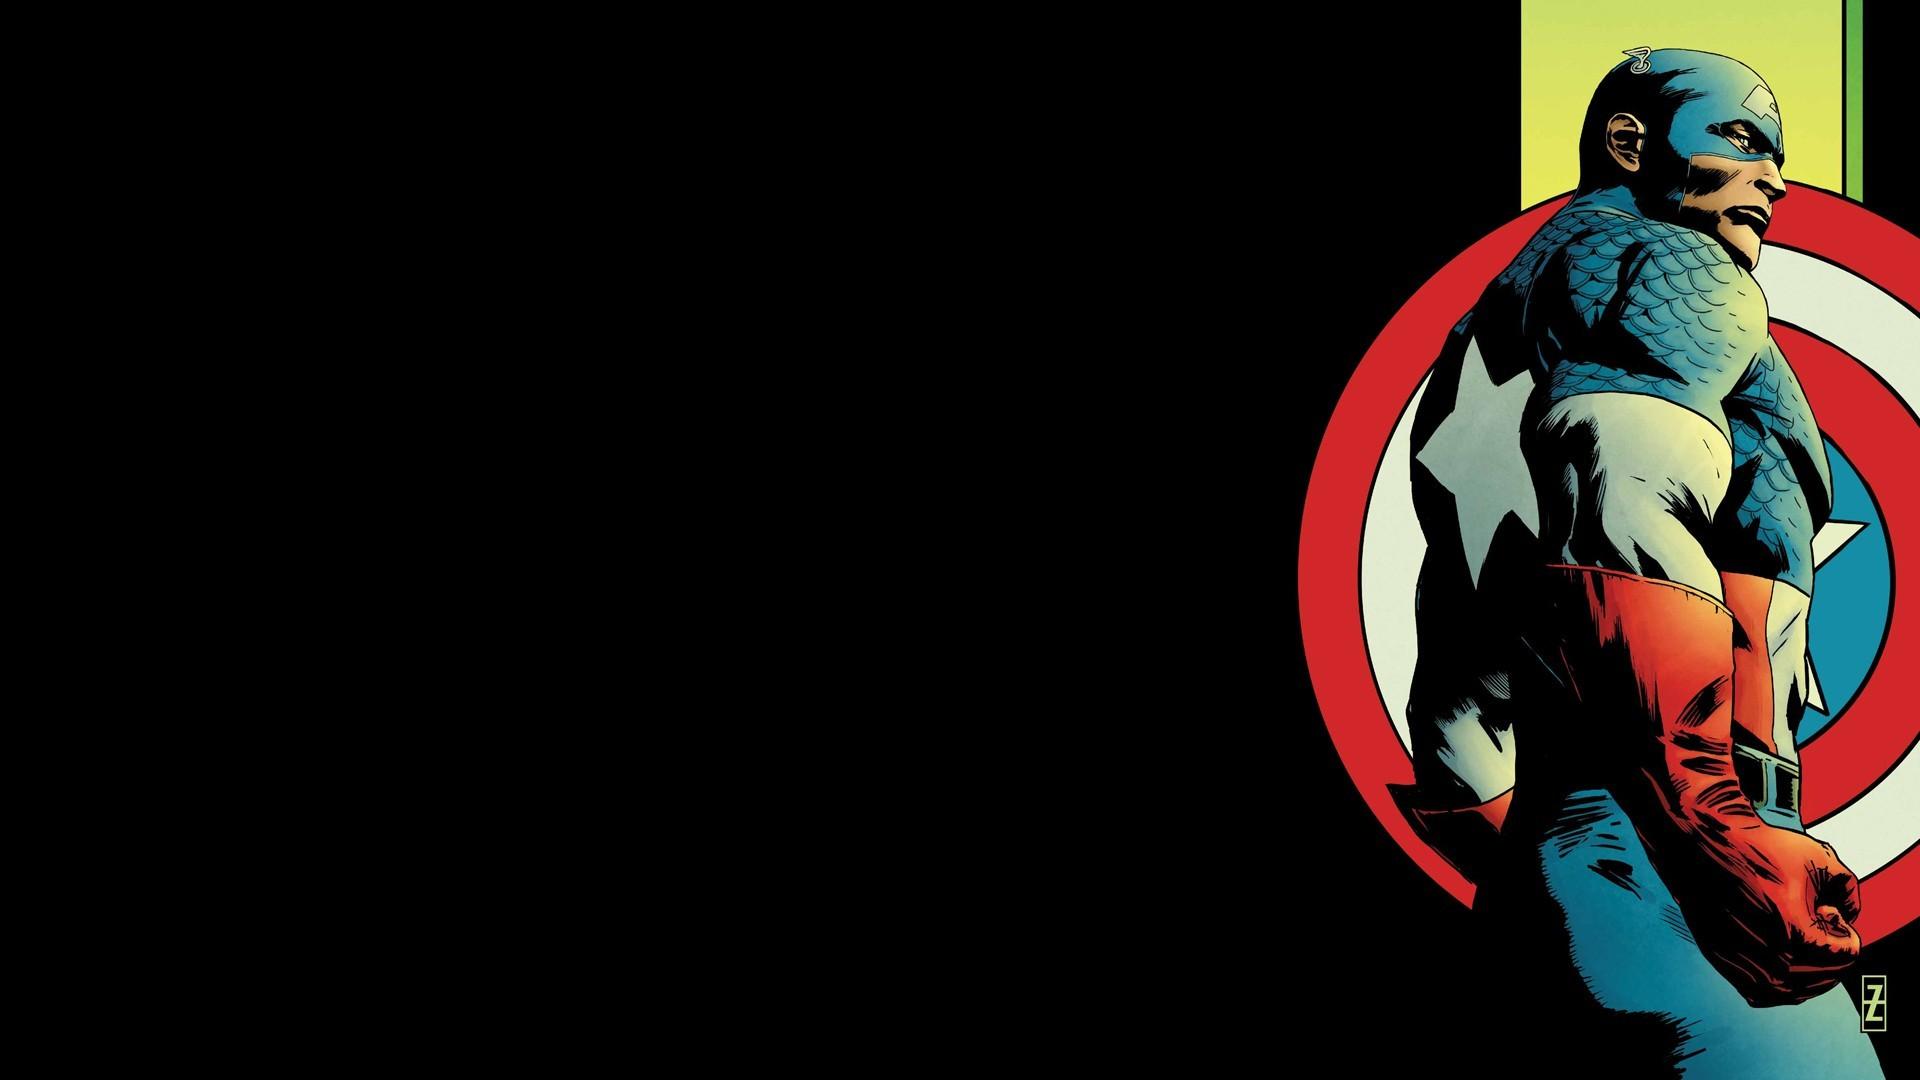 Captain America Comic Wallpapers (41 Wallpapers)